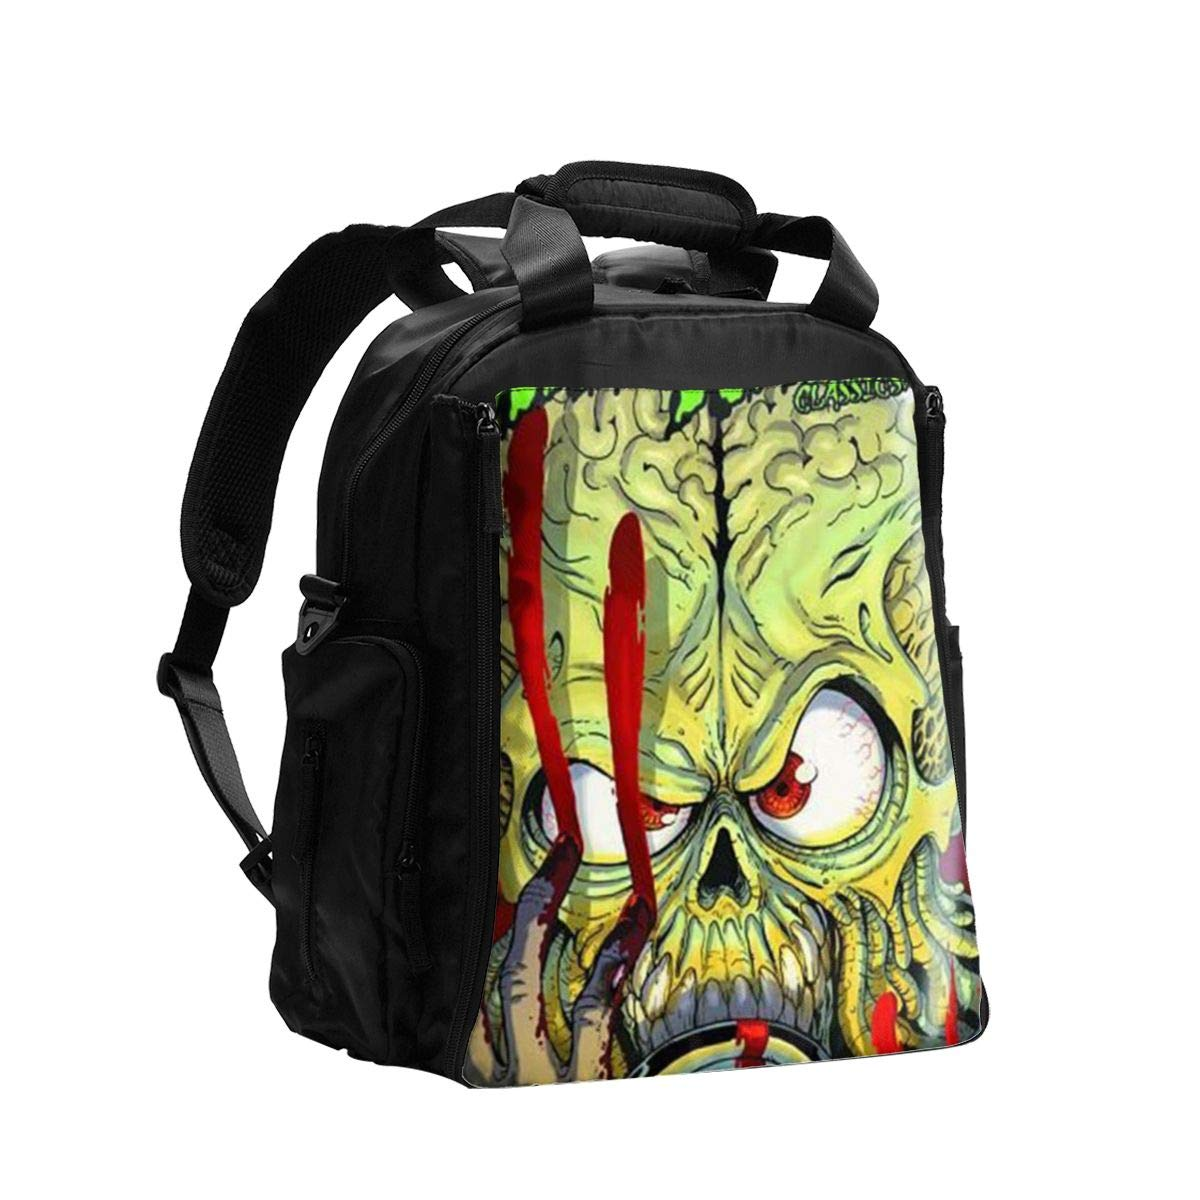 Mars Attacks Diaper Bag Backpack,Baby Travel Nappy Back Pack